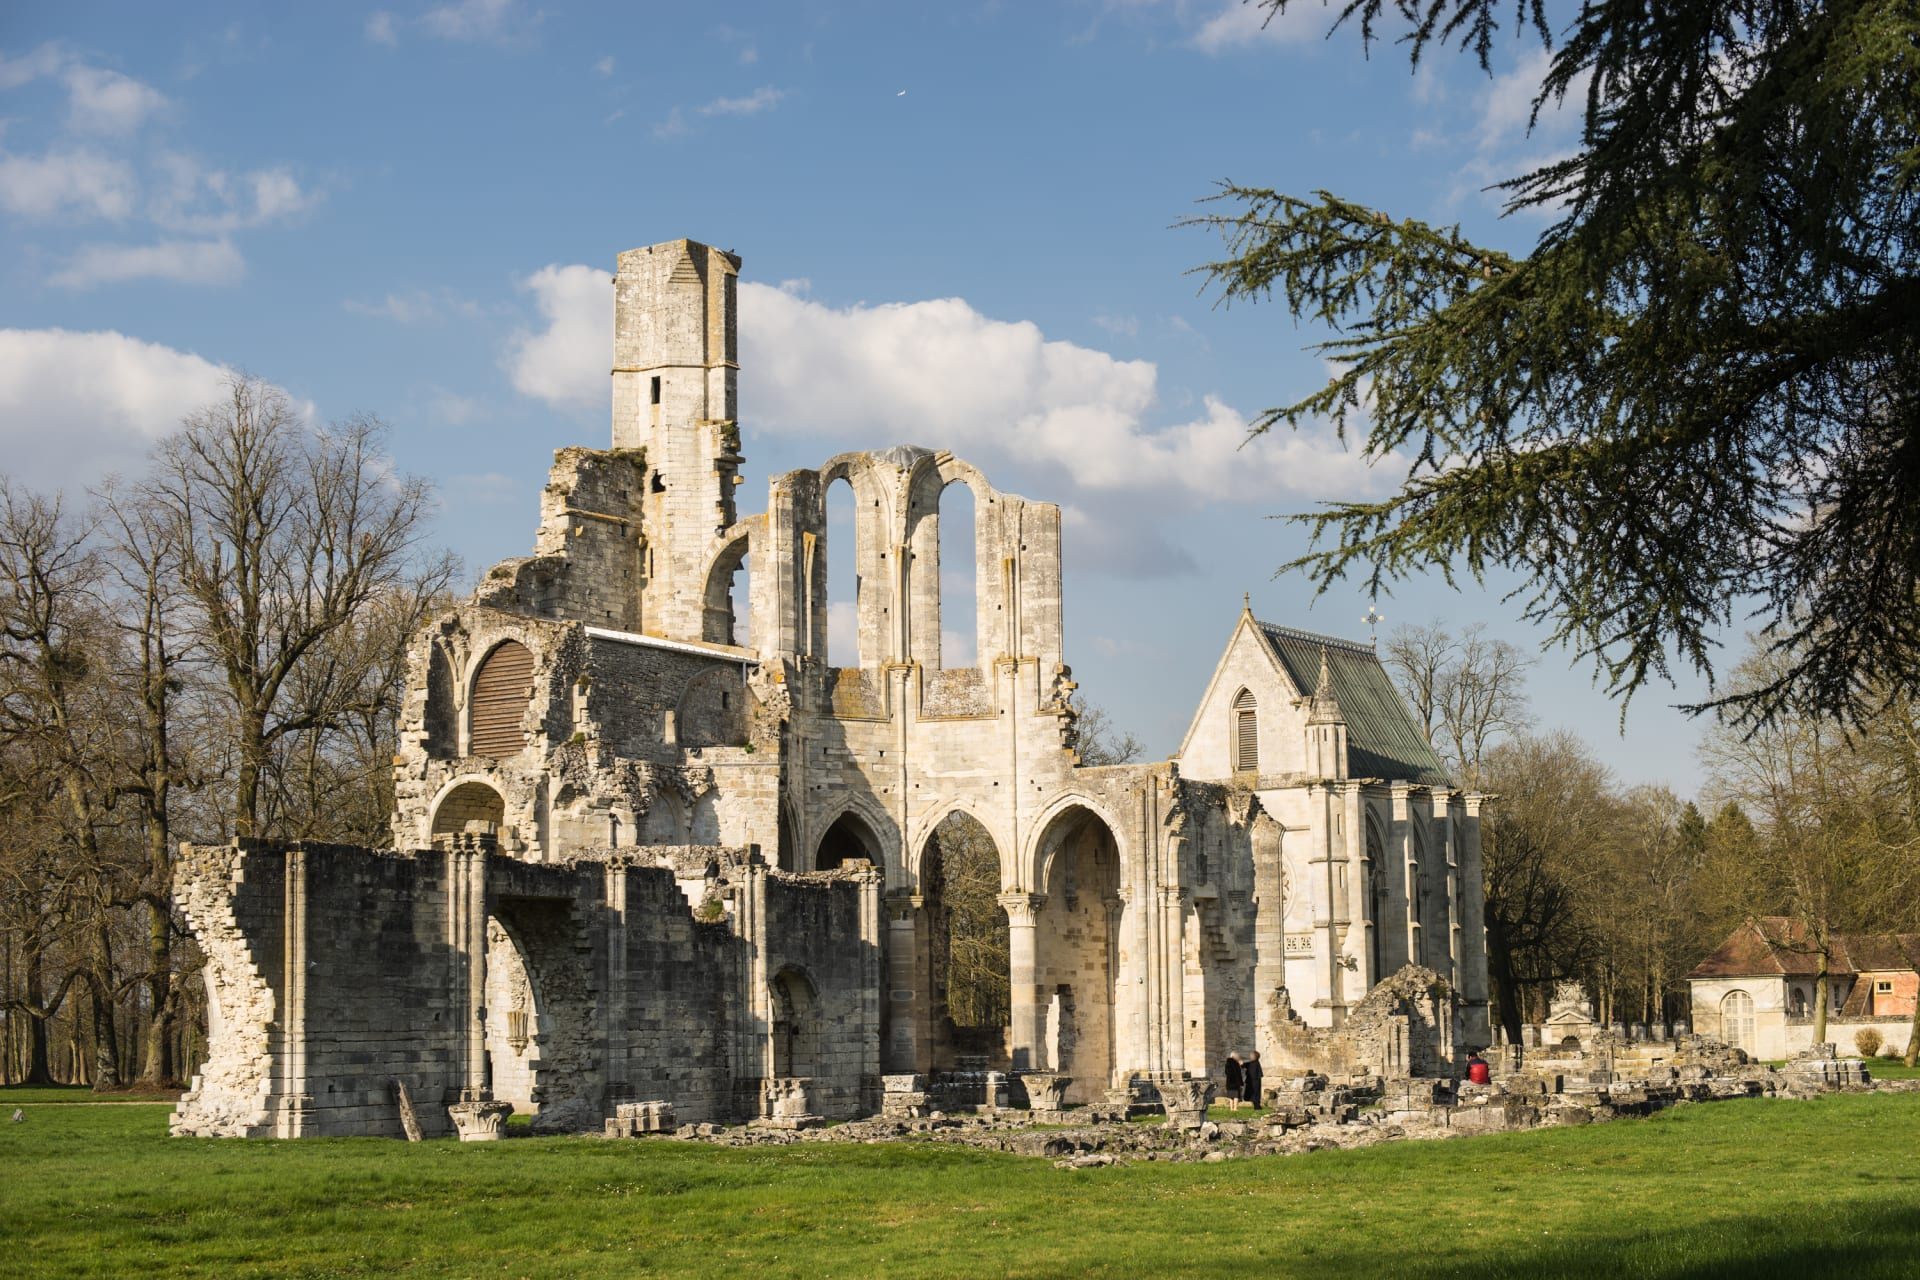 Oise - Abbey of Chaalis